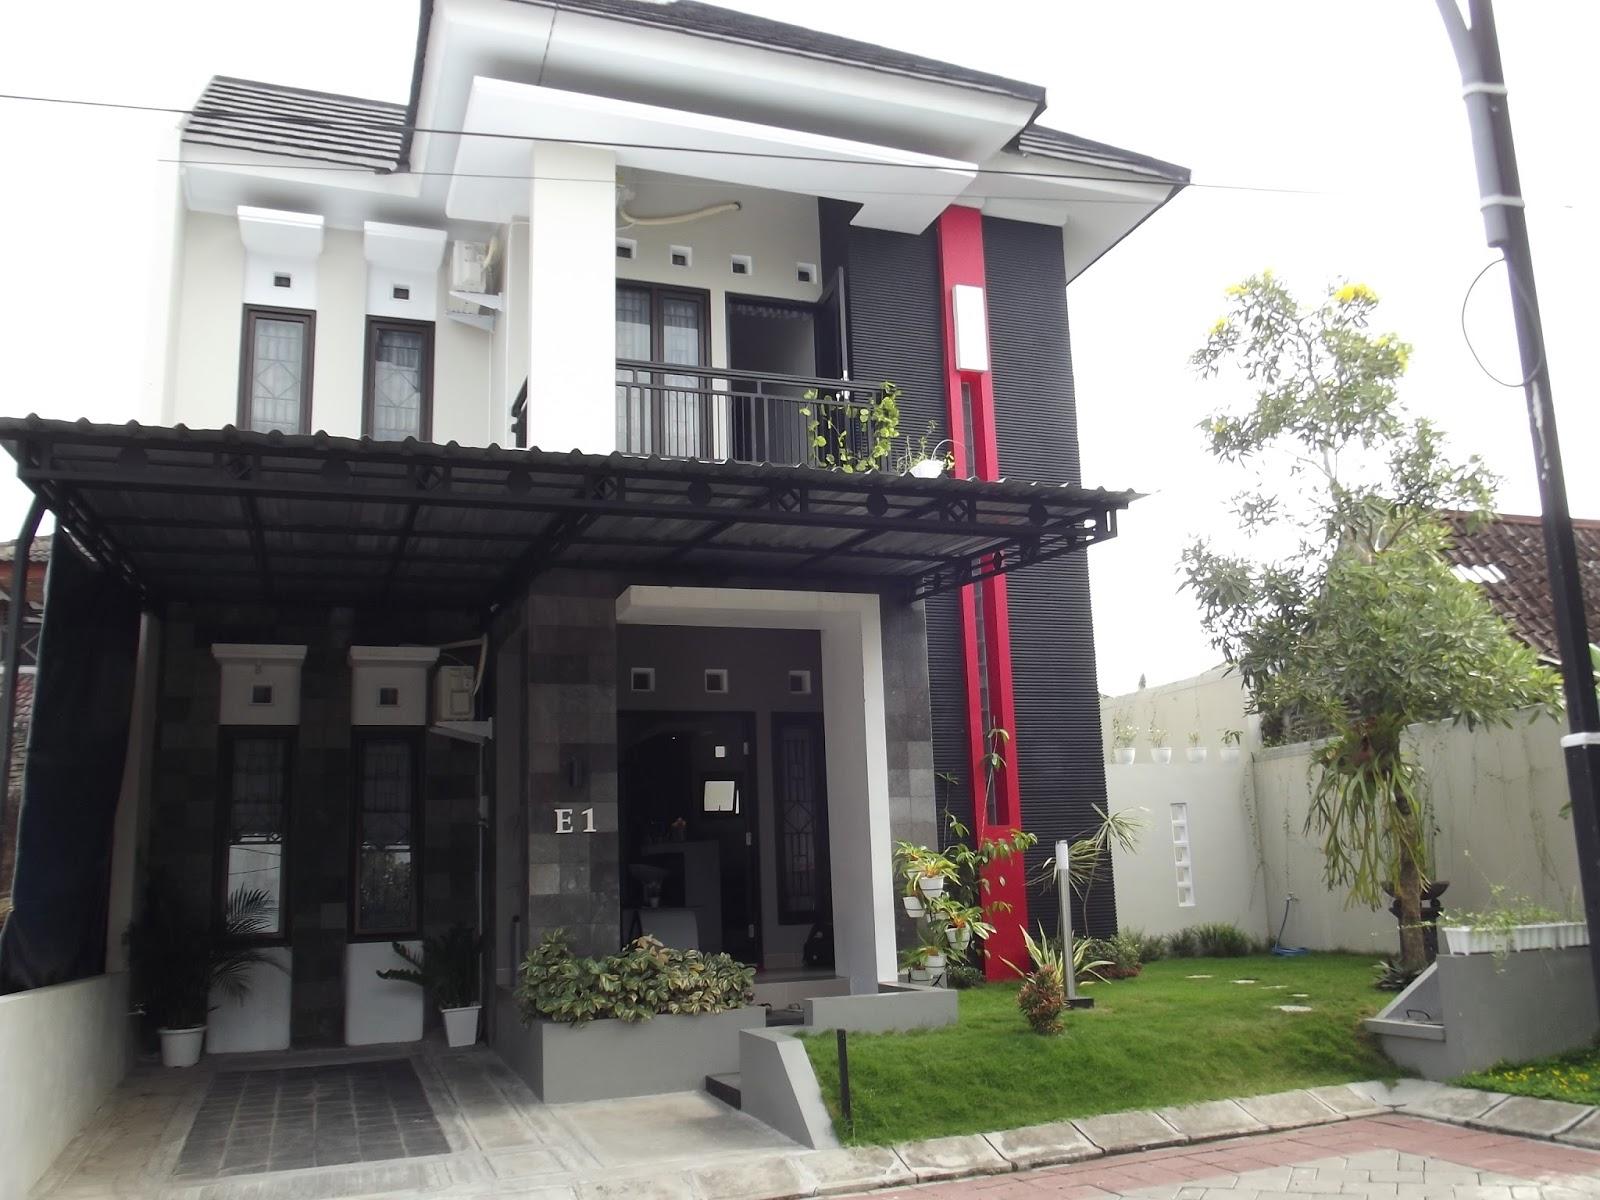 Rumah Kuantan Di Tengah Kota Jogja Homestay Jogja Rumah